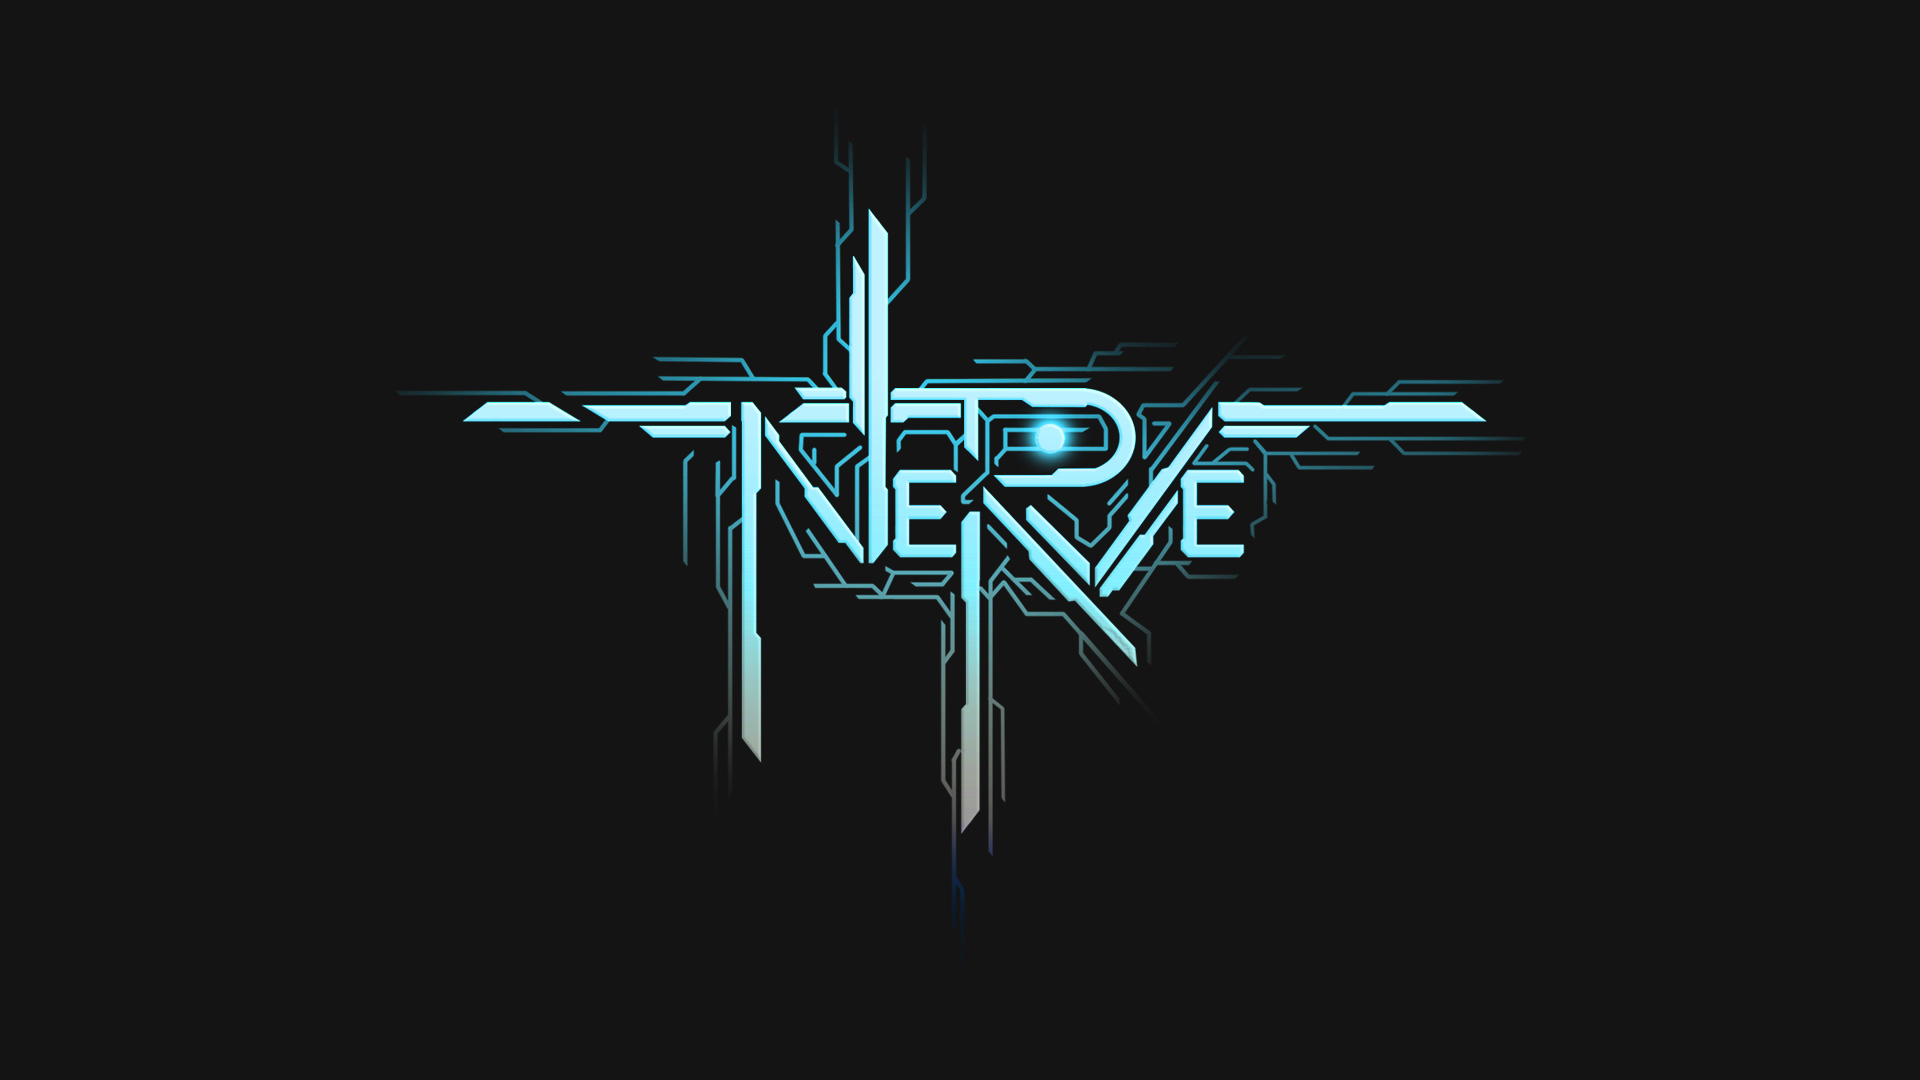 Nerve PSVR vrplayer.fr